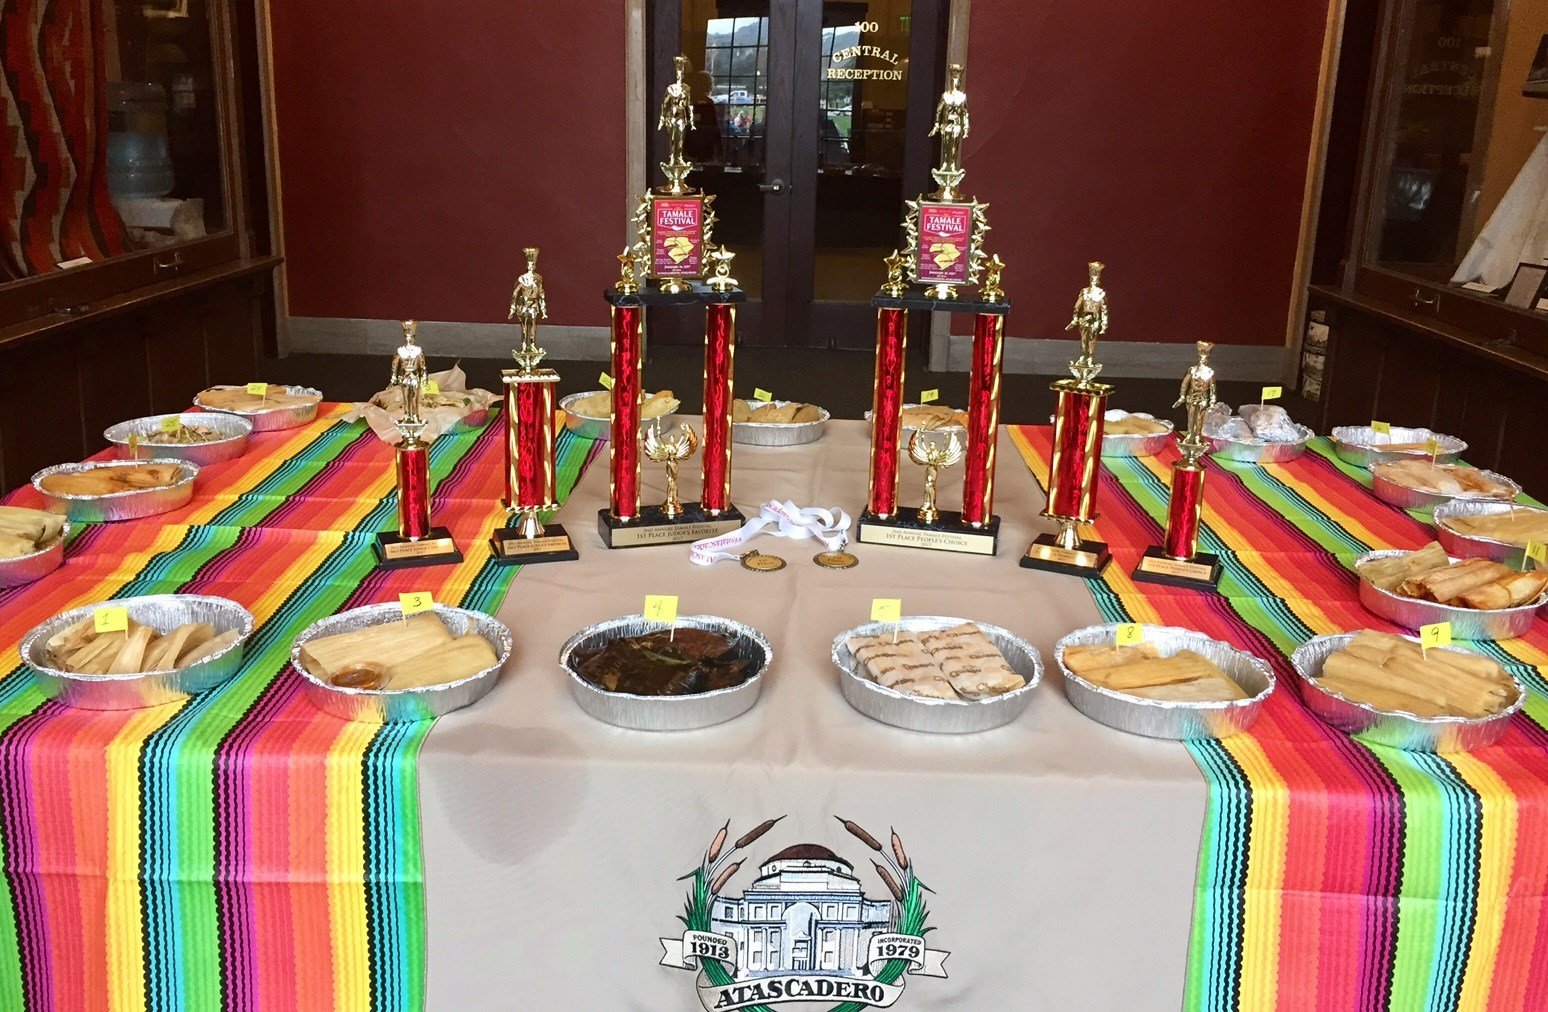 Tamale Festival 2017 (Photo courtesy City of Atascadero)